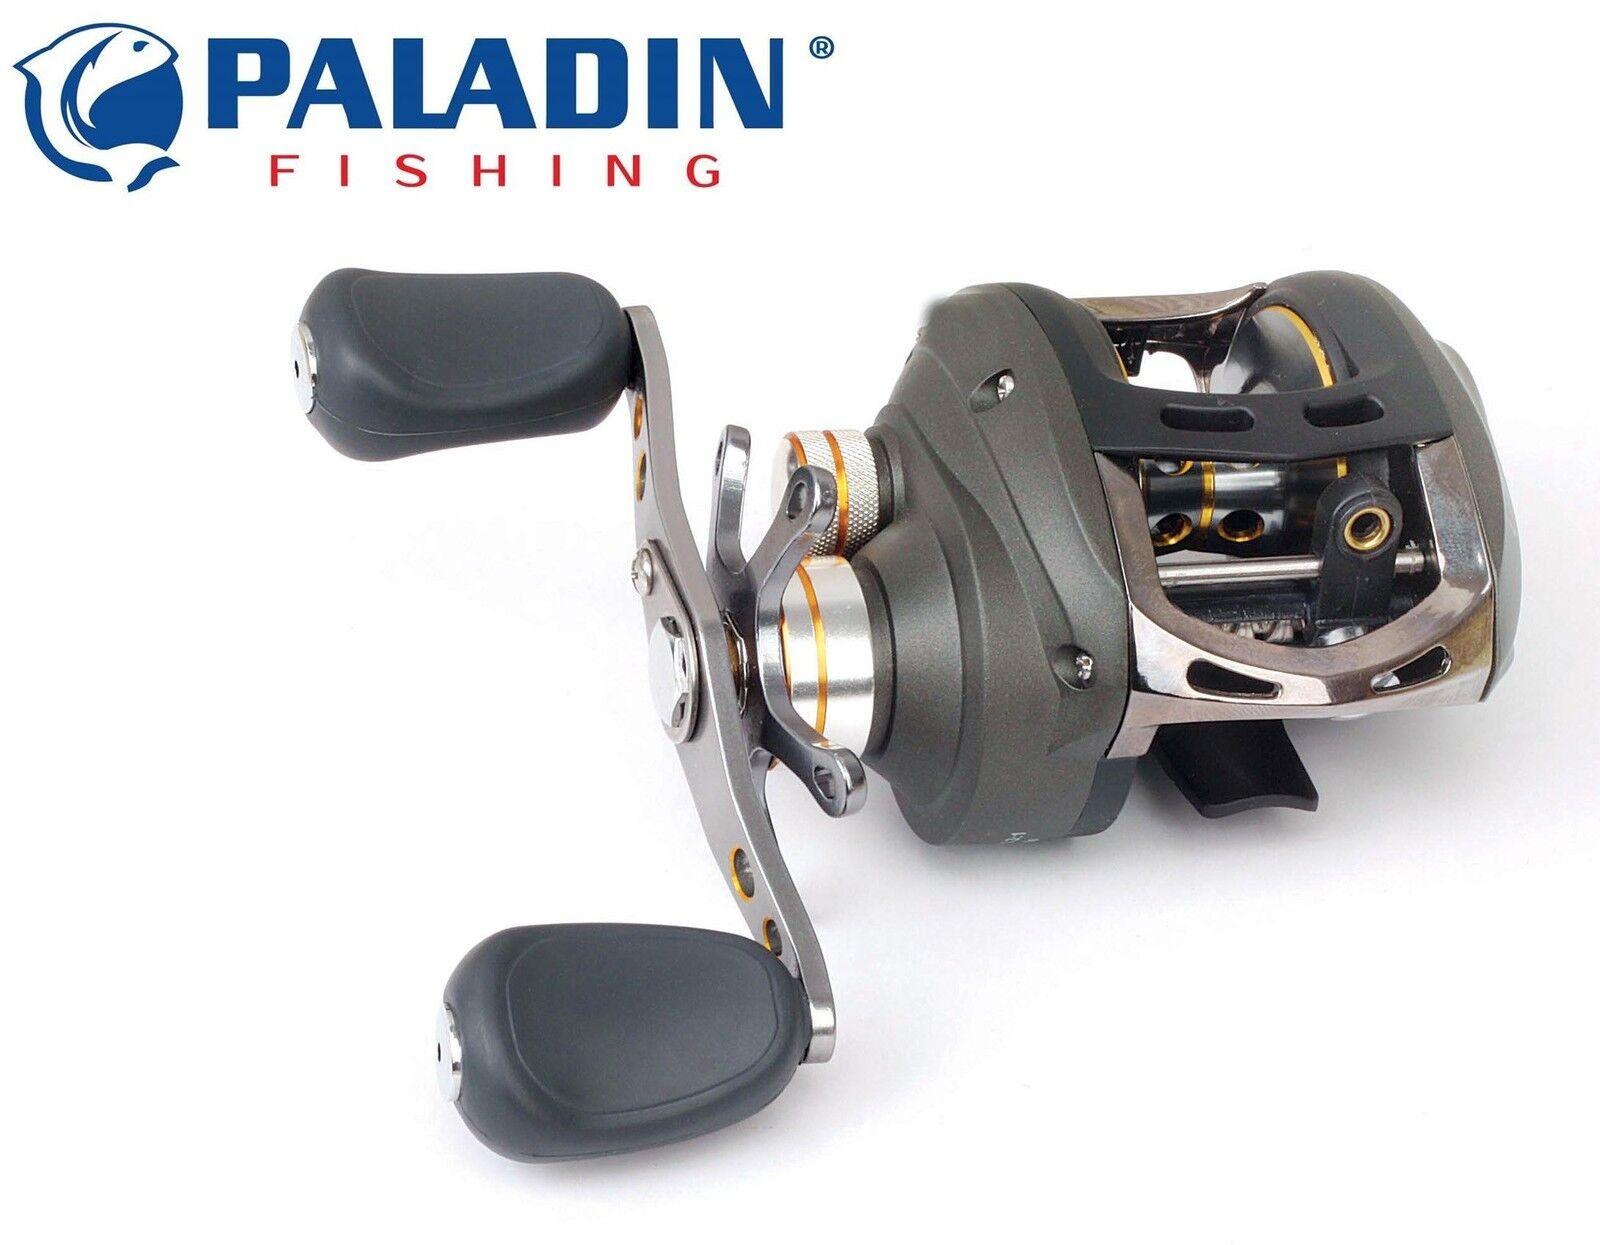 Paladin Palcast DLX-R DLX-R DLX-R - Multirolle, Baitcaster Rolle, Spinnrolle, Angelrolle 92b6ae